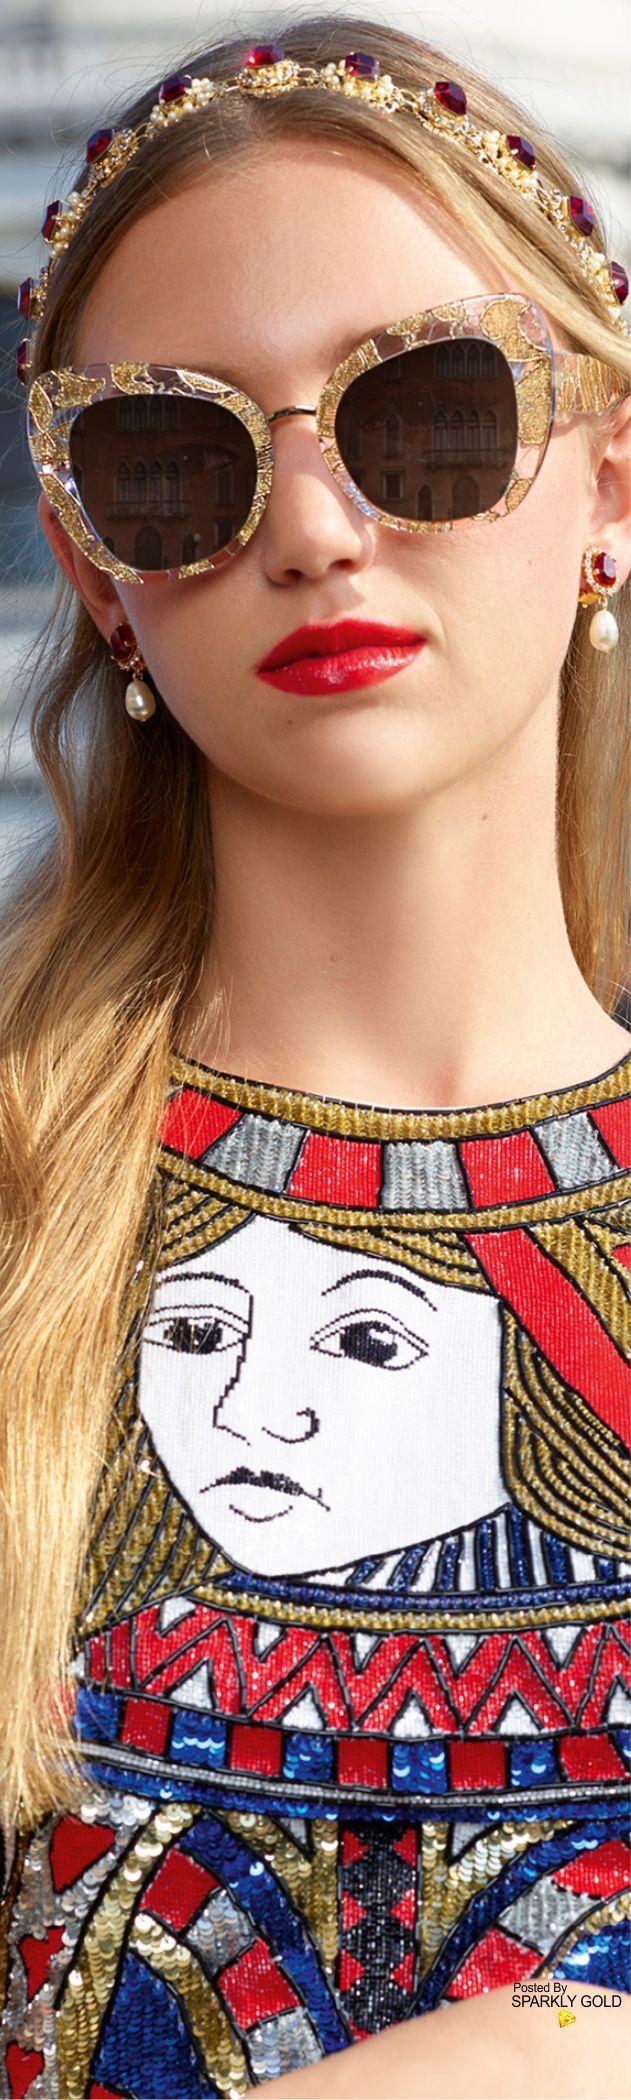 Dolce & Gabbana S/S 2018 Campaign